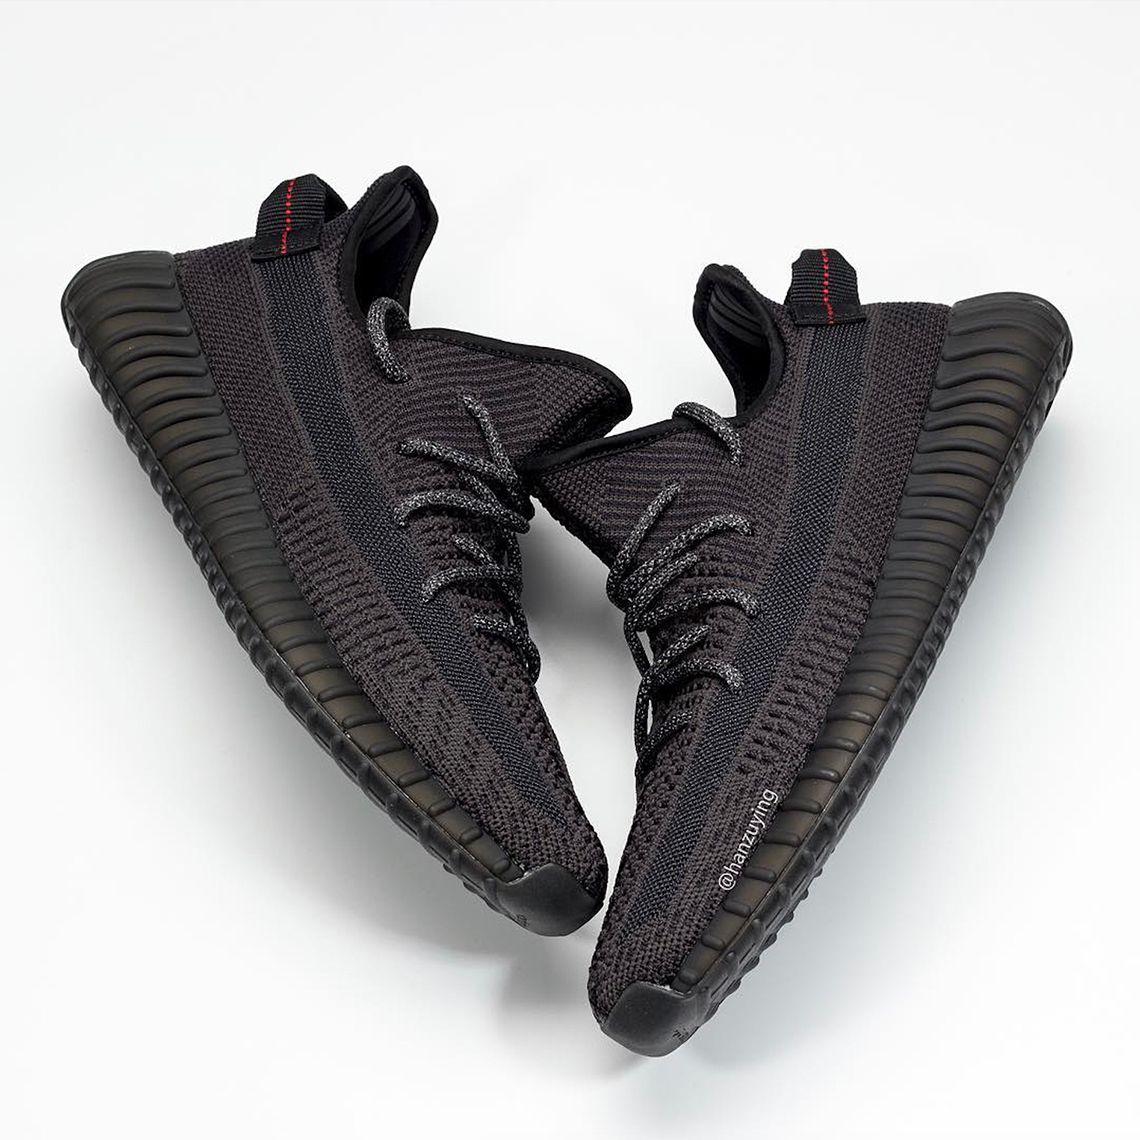 adidas Yeezy 350 v2 Black - Release